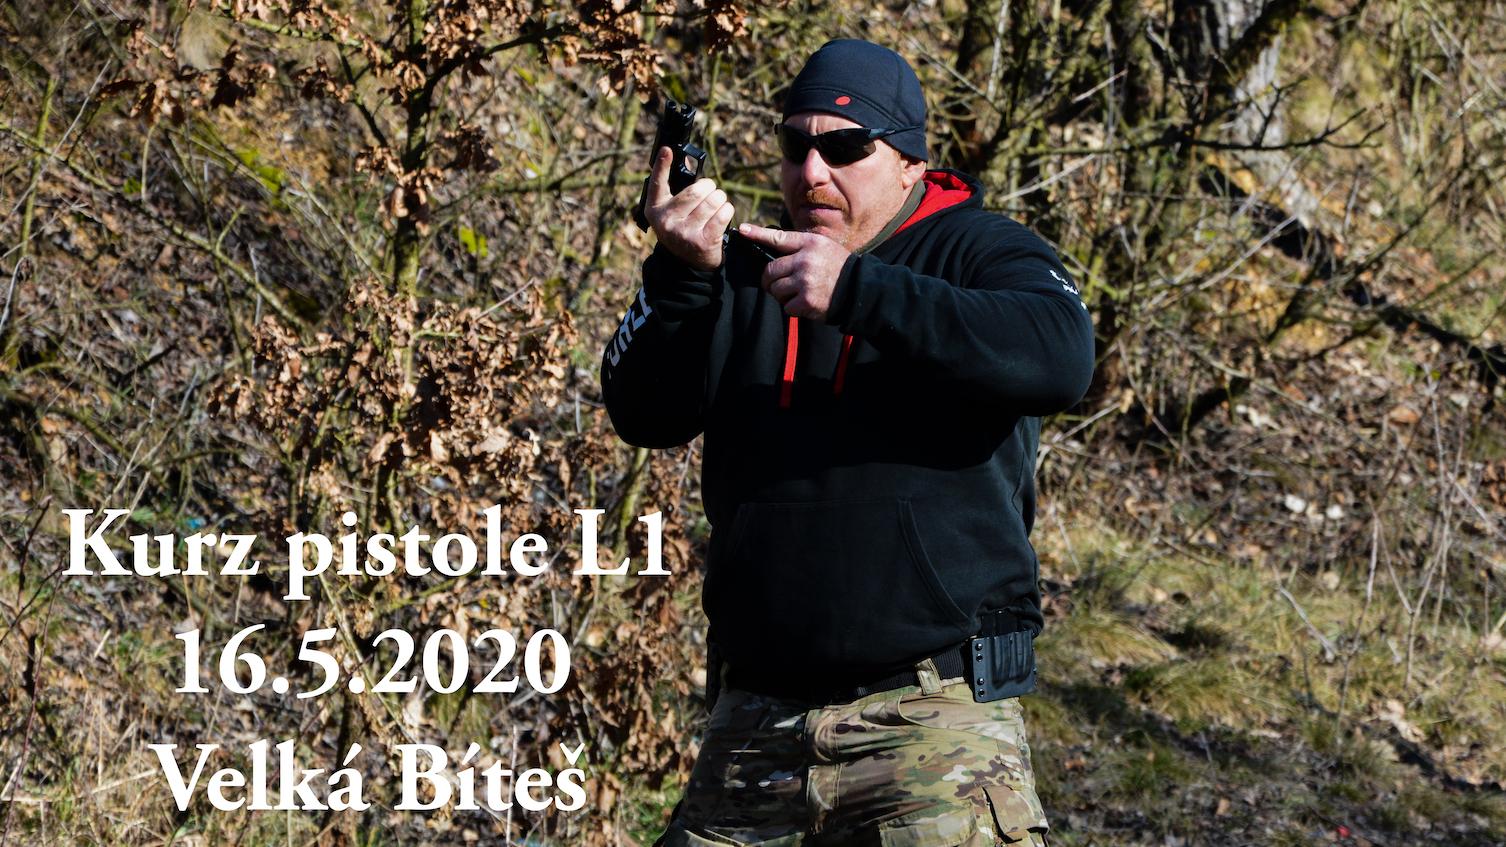 Kurz pistole L1 dne 16.5.2020